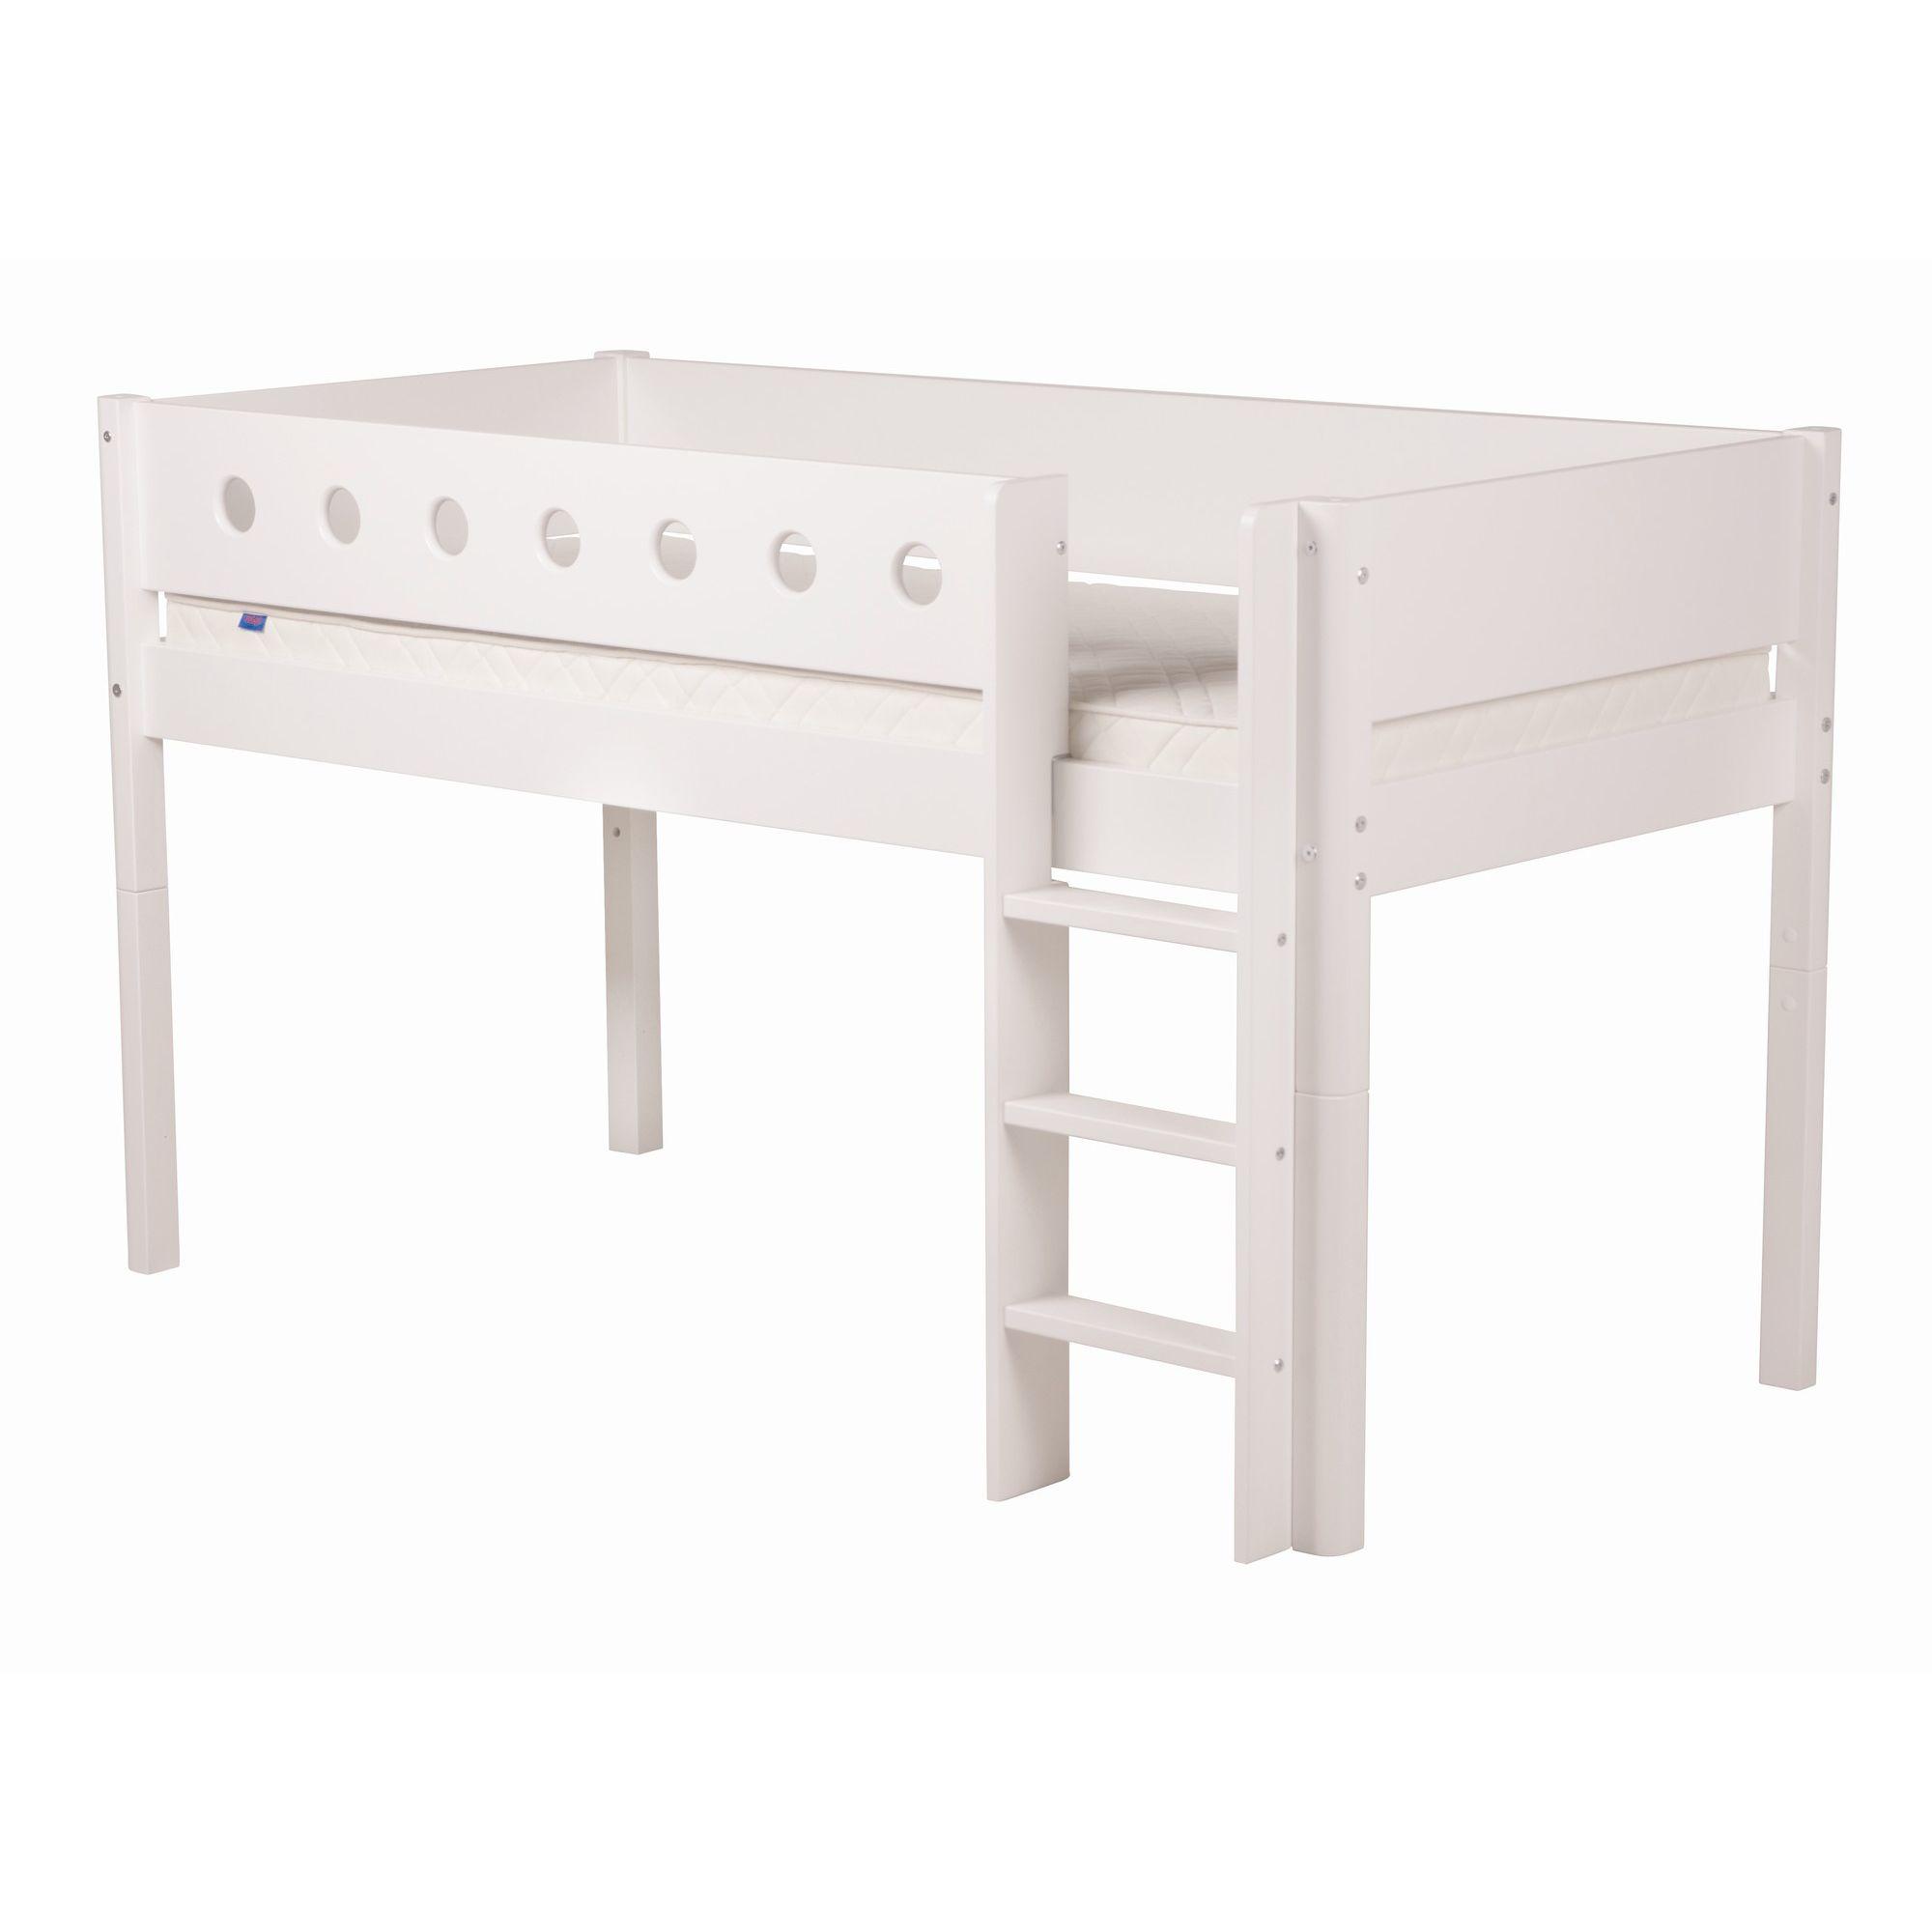 Flexa White Midsleeper Bed - White - White at Tesco Direct